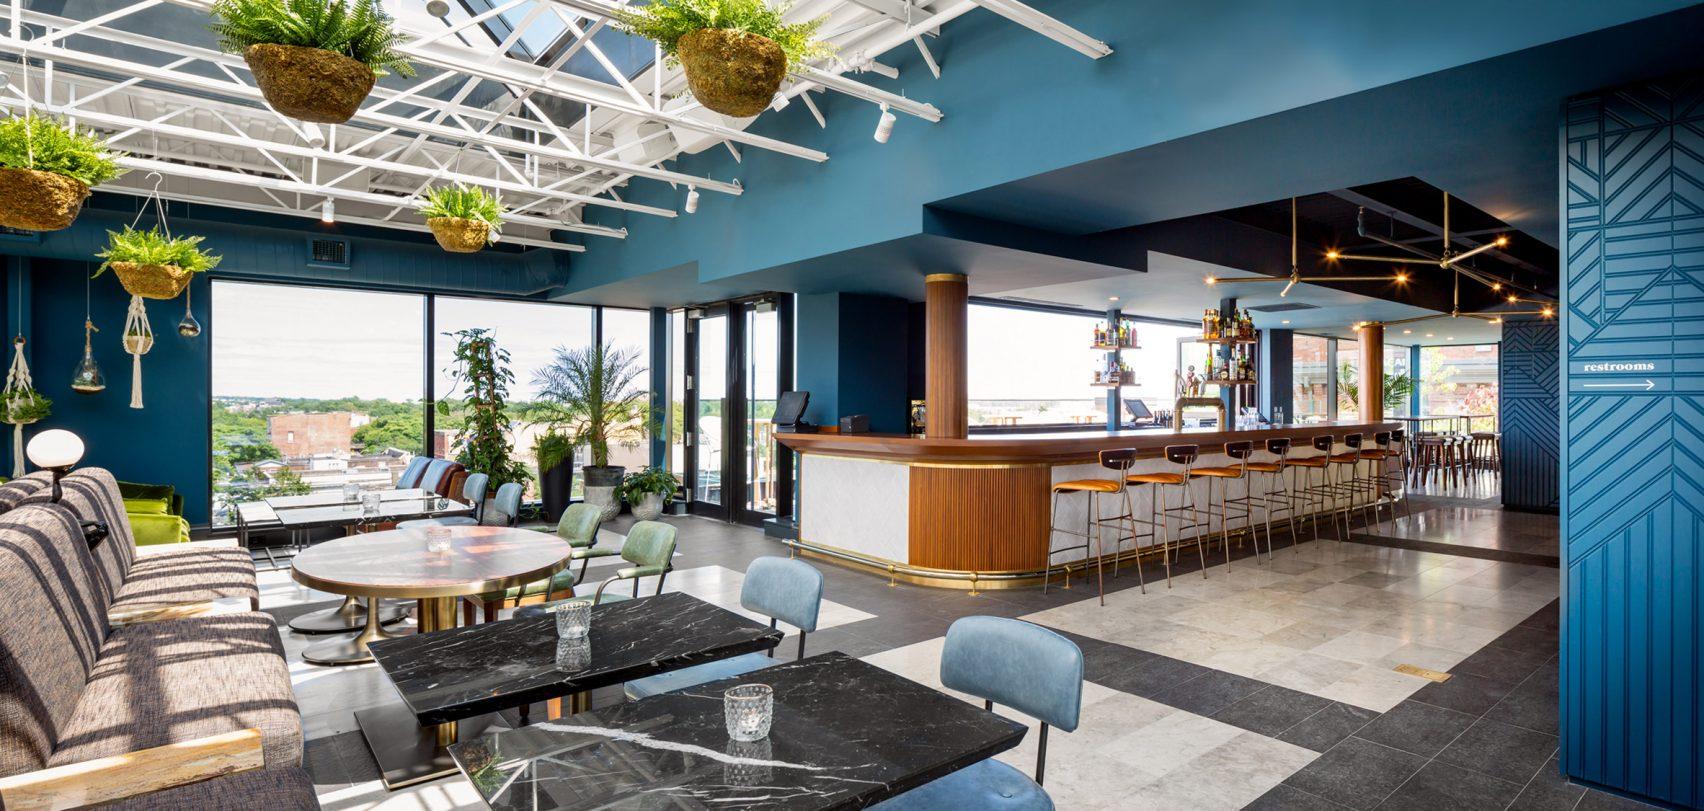 Van stripclub tot een stijlvol designhotel - The Broadview Hotel!